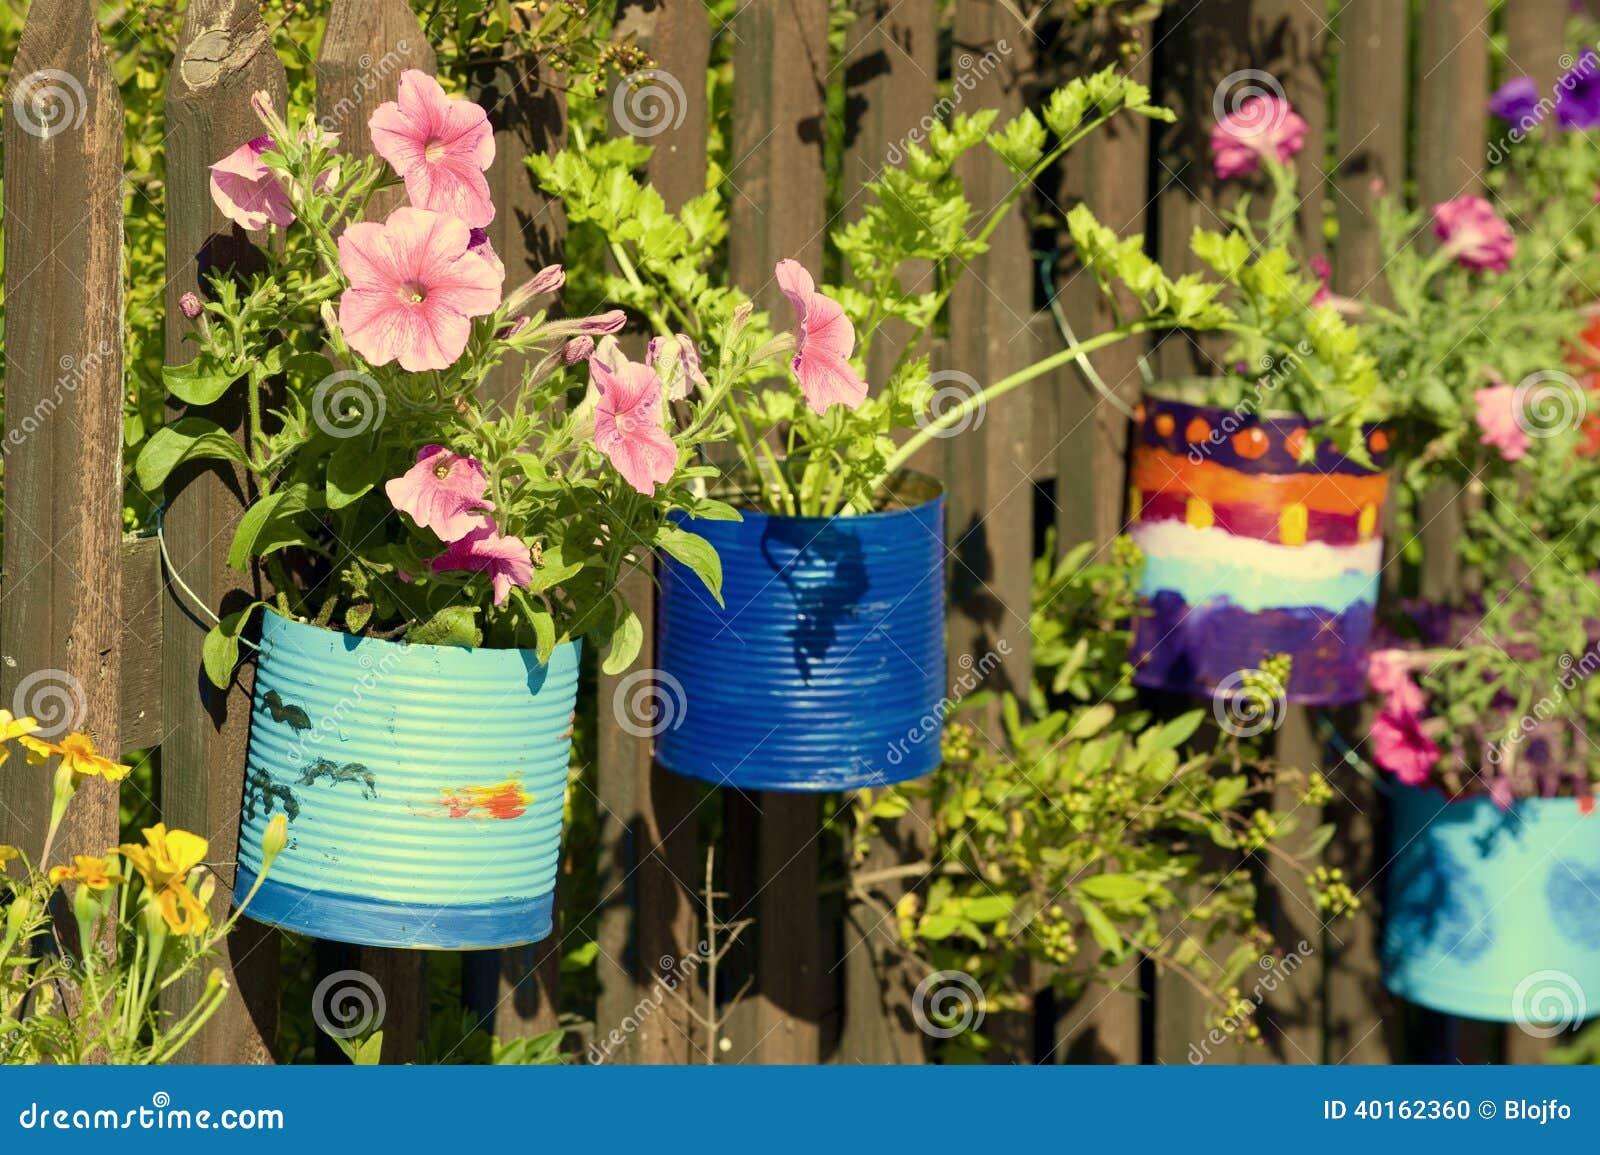 Vasi dipinti fotografia stock immagine di fiori arte for Vasi di fiori dipinti